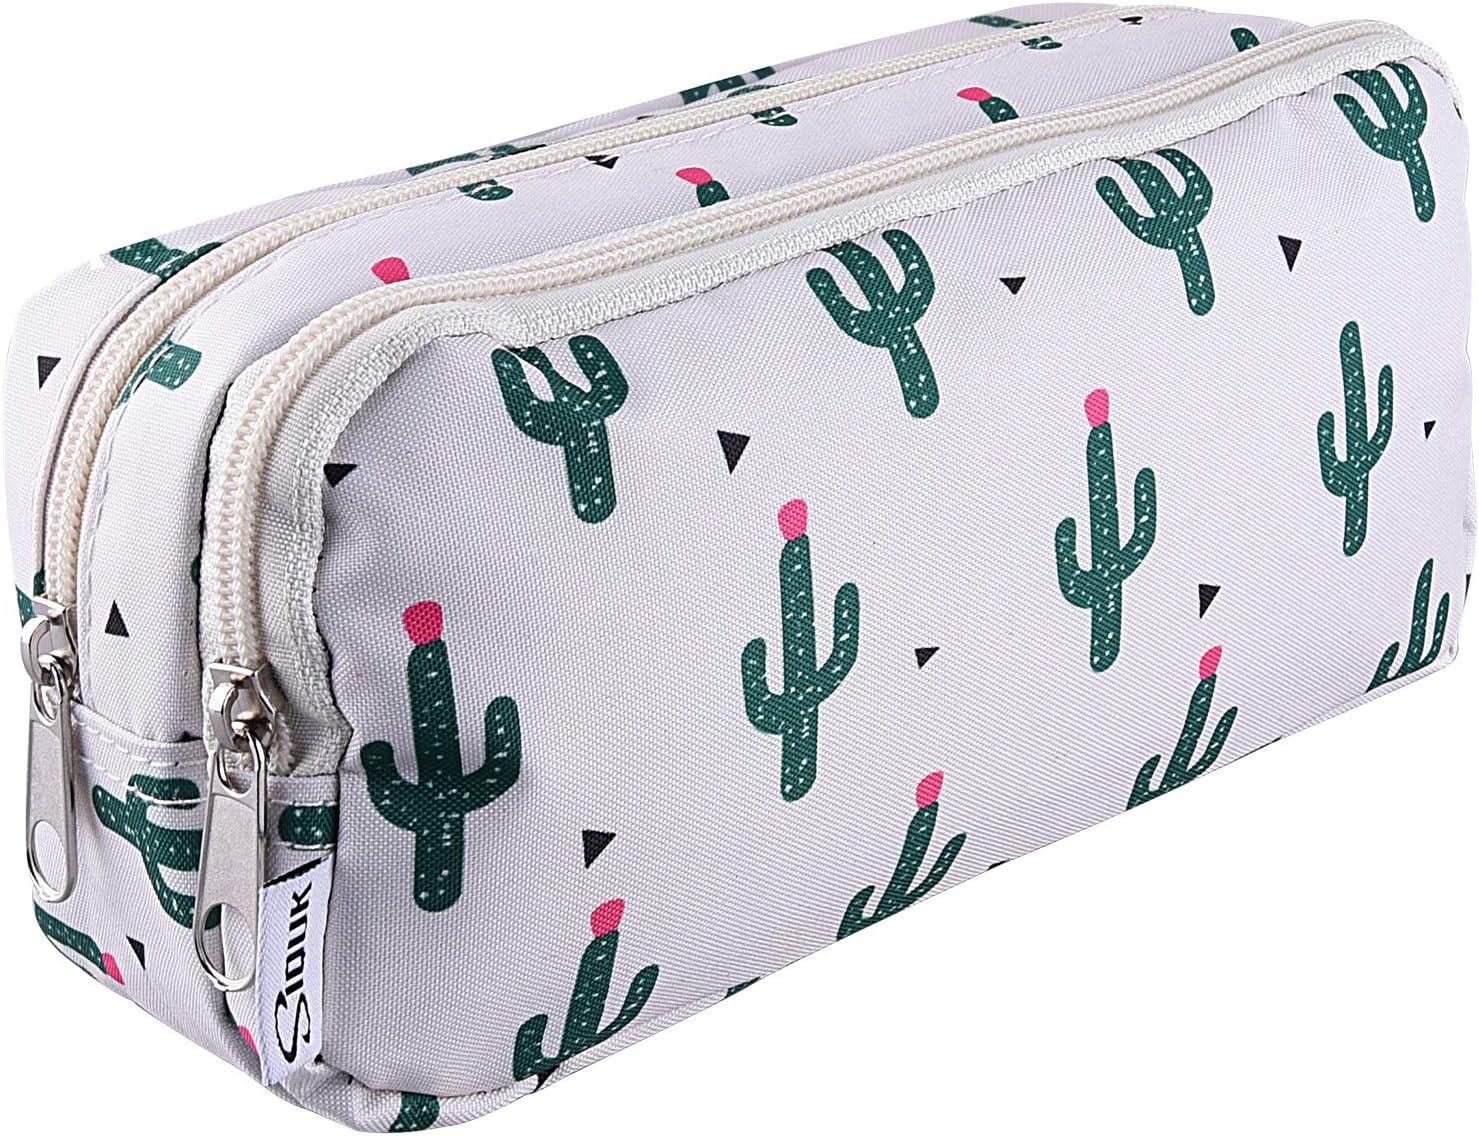 New Shipping Free Shipping SIQUK Cactus Pencil Case Large half Capacity Zippers Double Pen